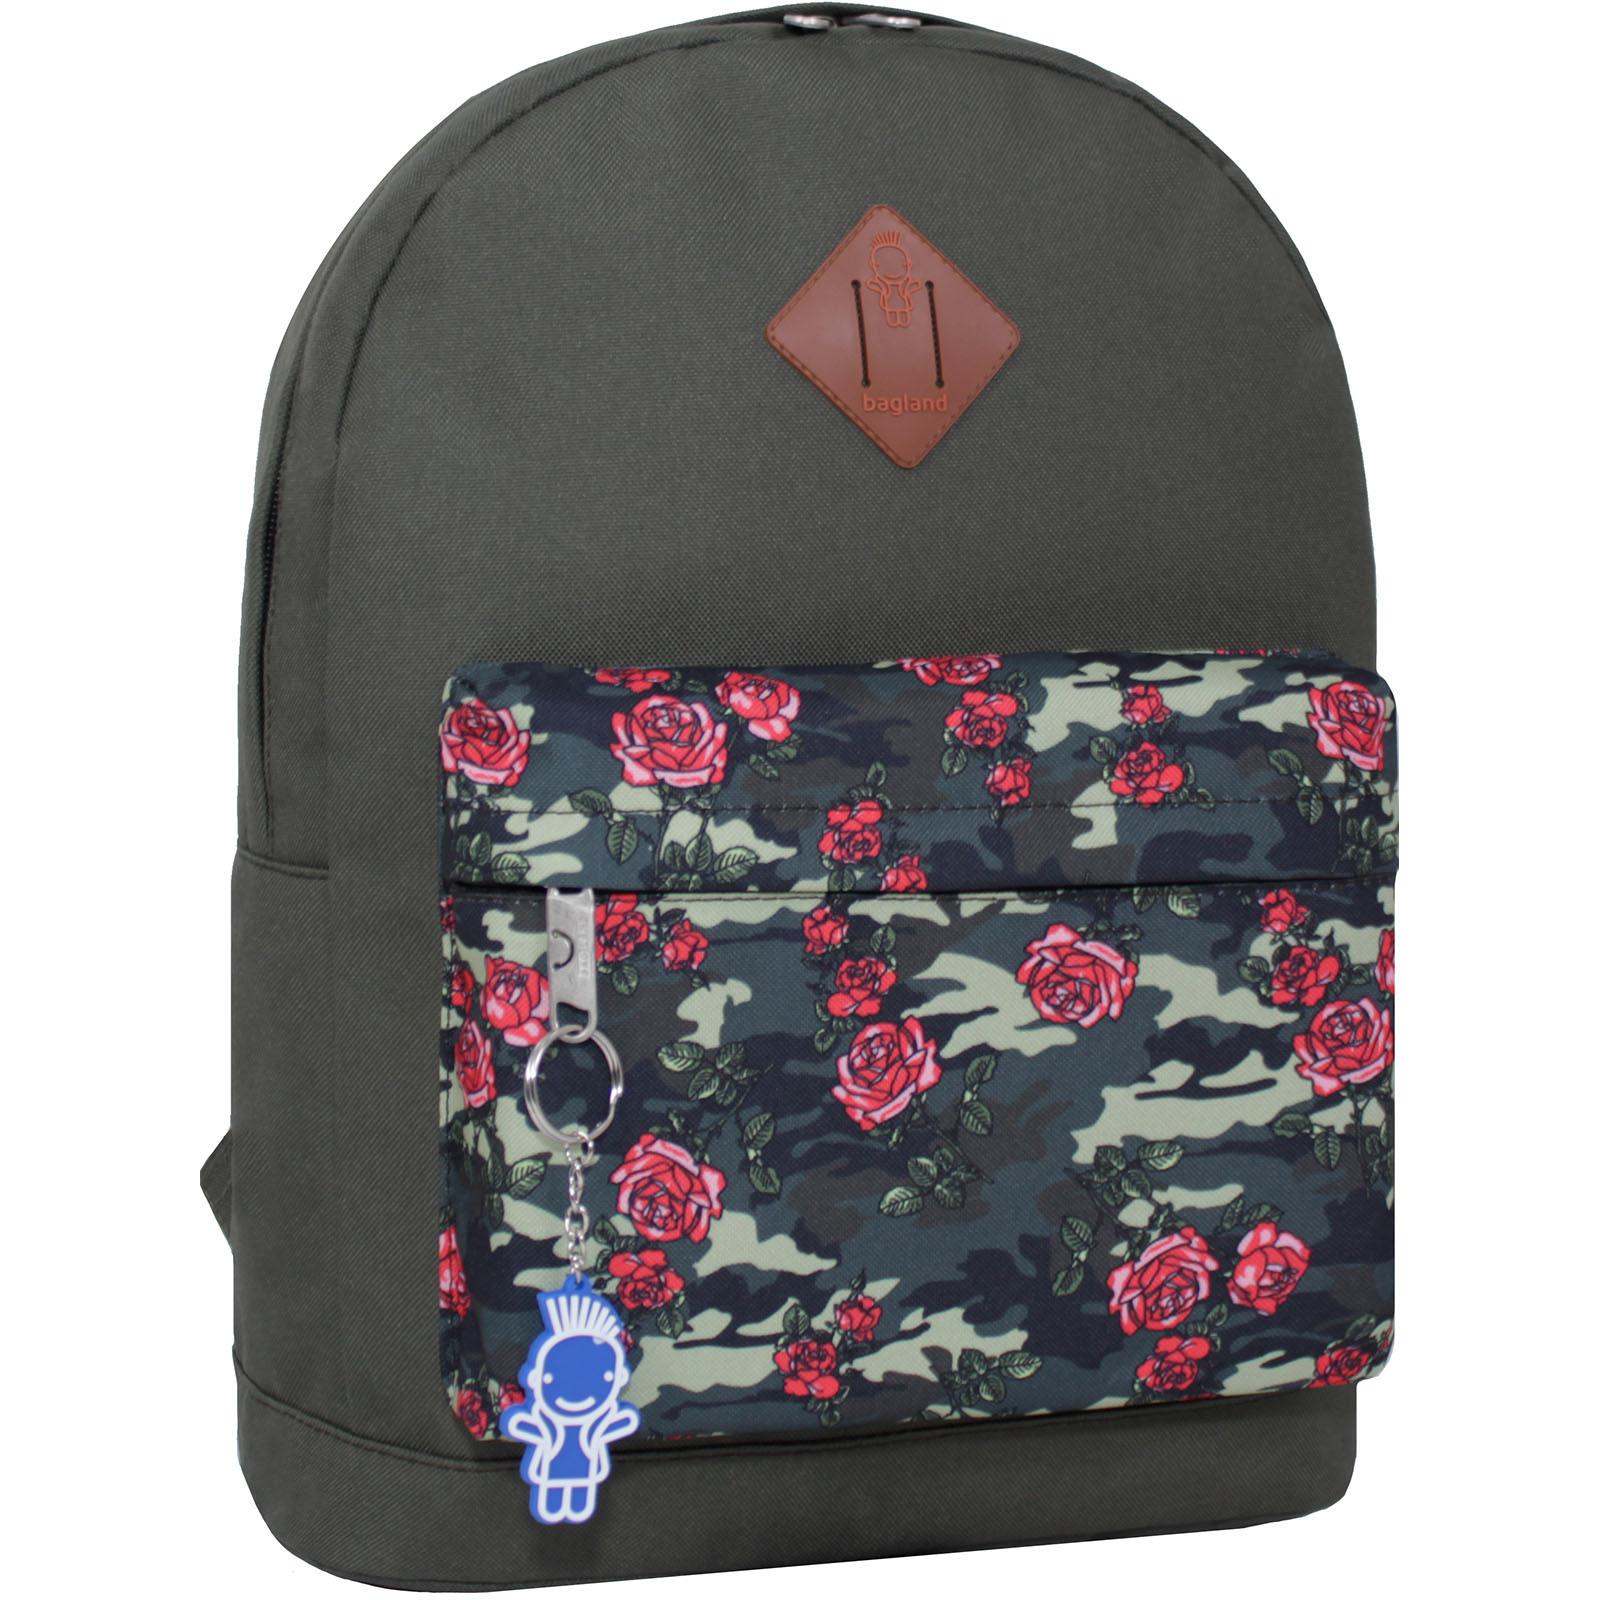 Городские рюкзаки Рюкзак Bagland Молодежный W/R 17 л. Хаки 470 (00533662) IMG_2265_суб.470_.JPG